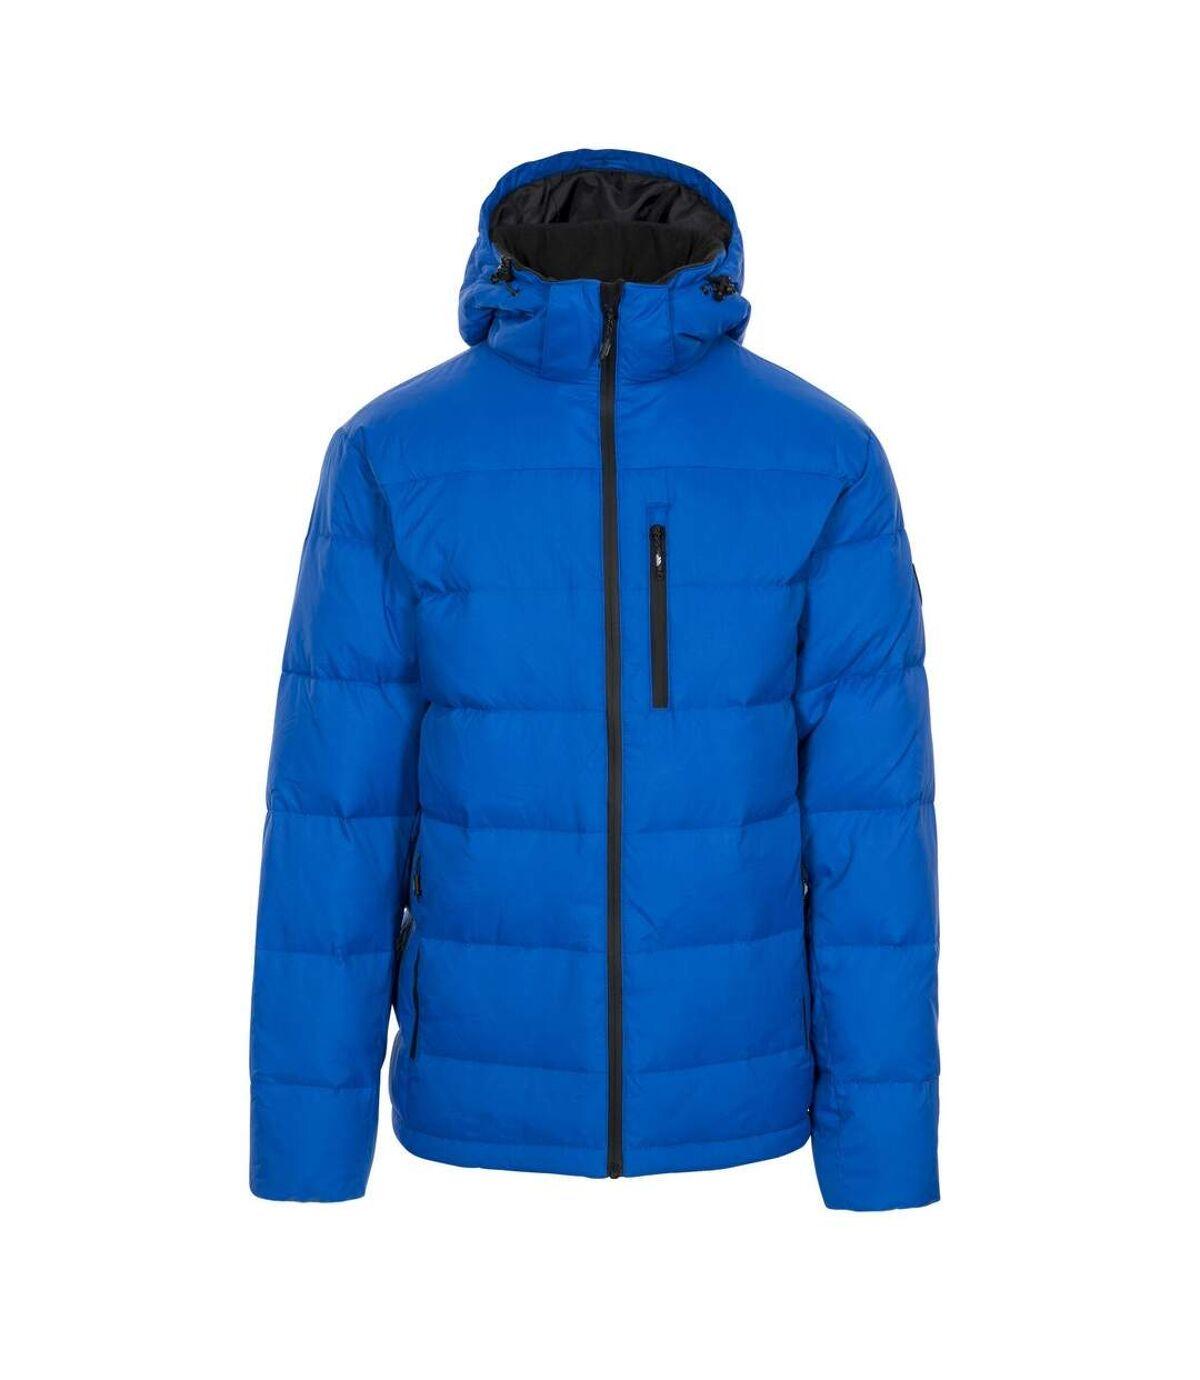 Trespass Mens Orwell Down Jacket (Blue) - UTTP4815